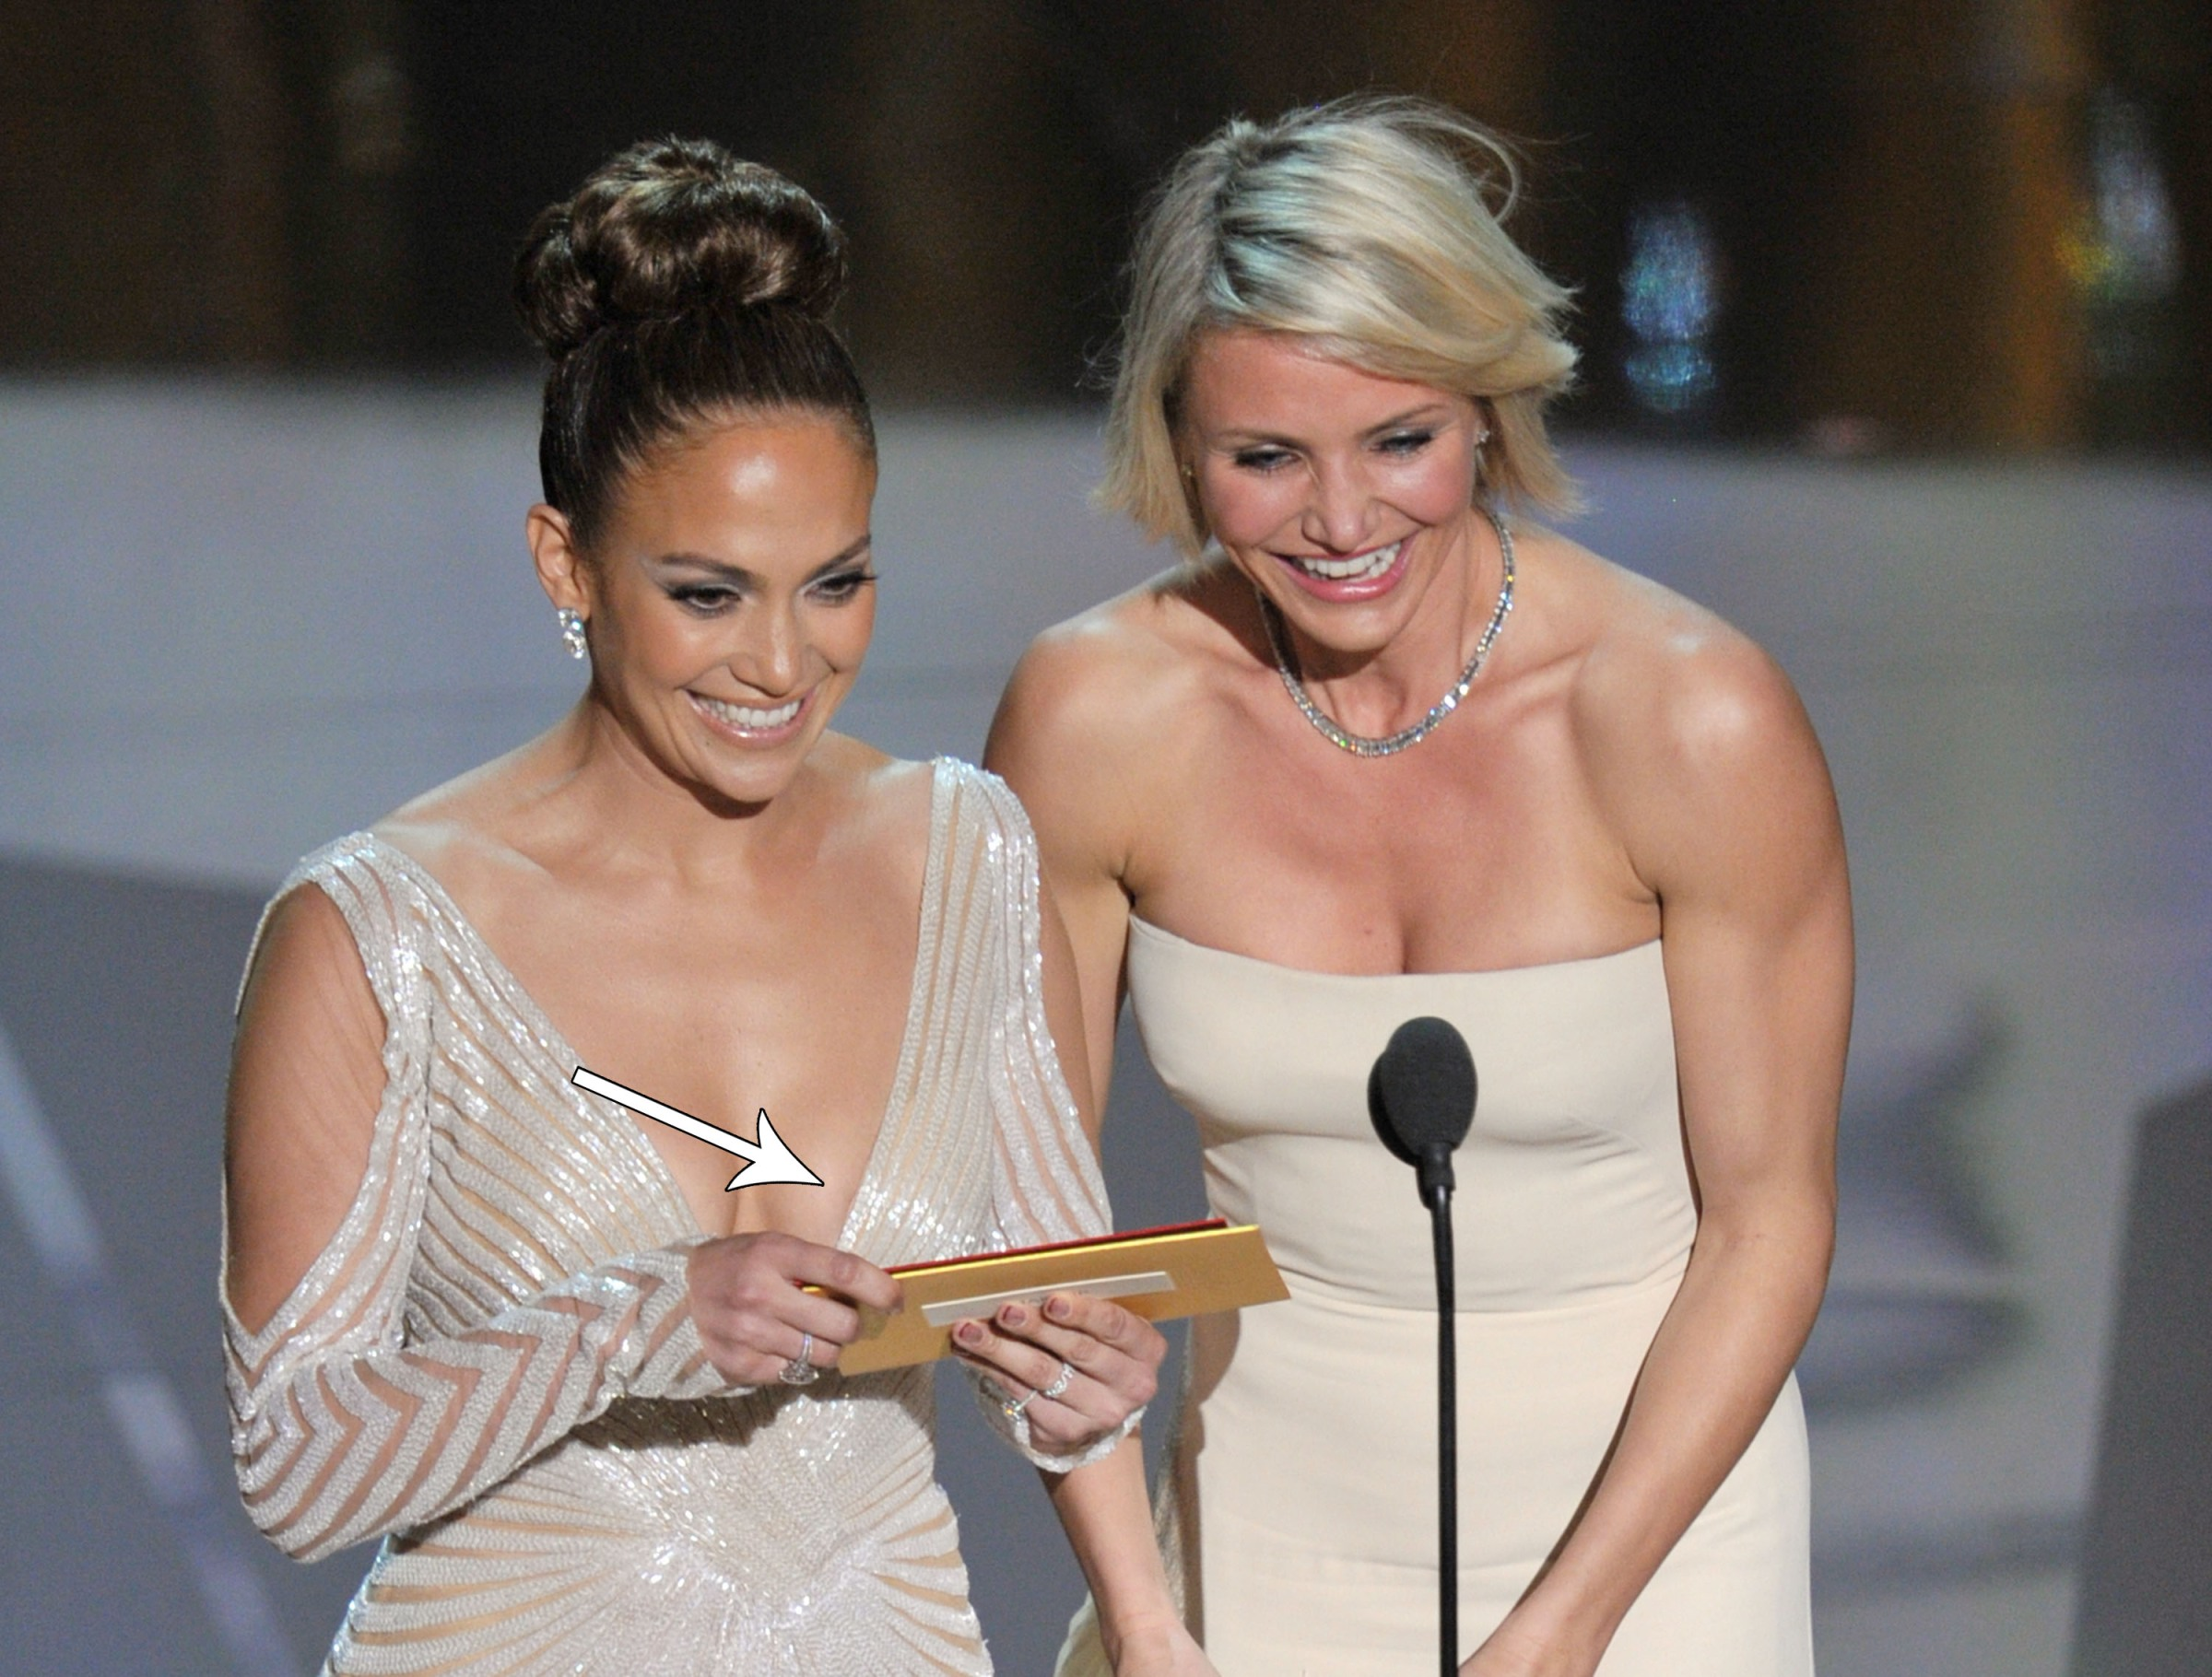 Did Jennifer Lopez Have a Wardrobe Malfunction at the Oscars?